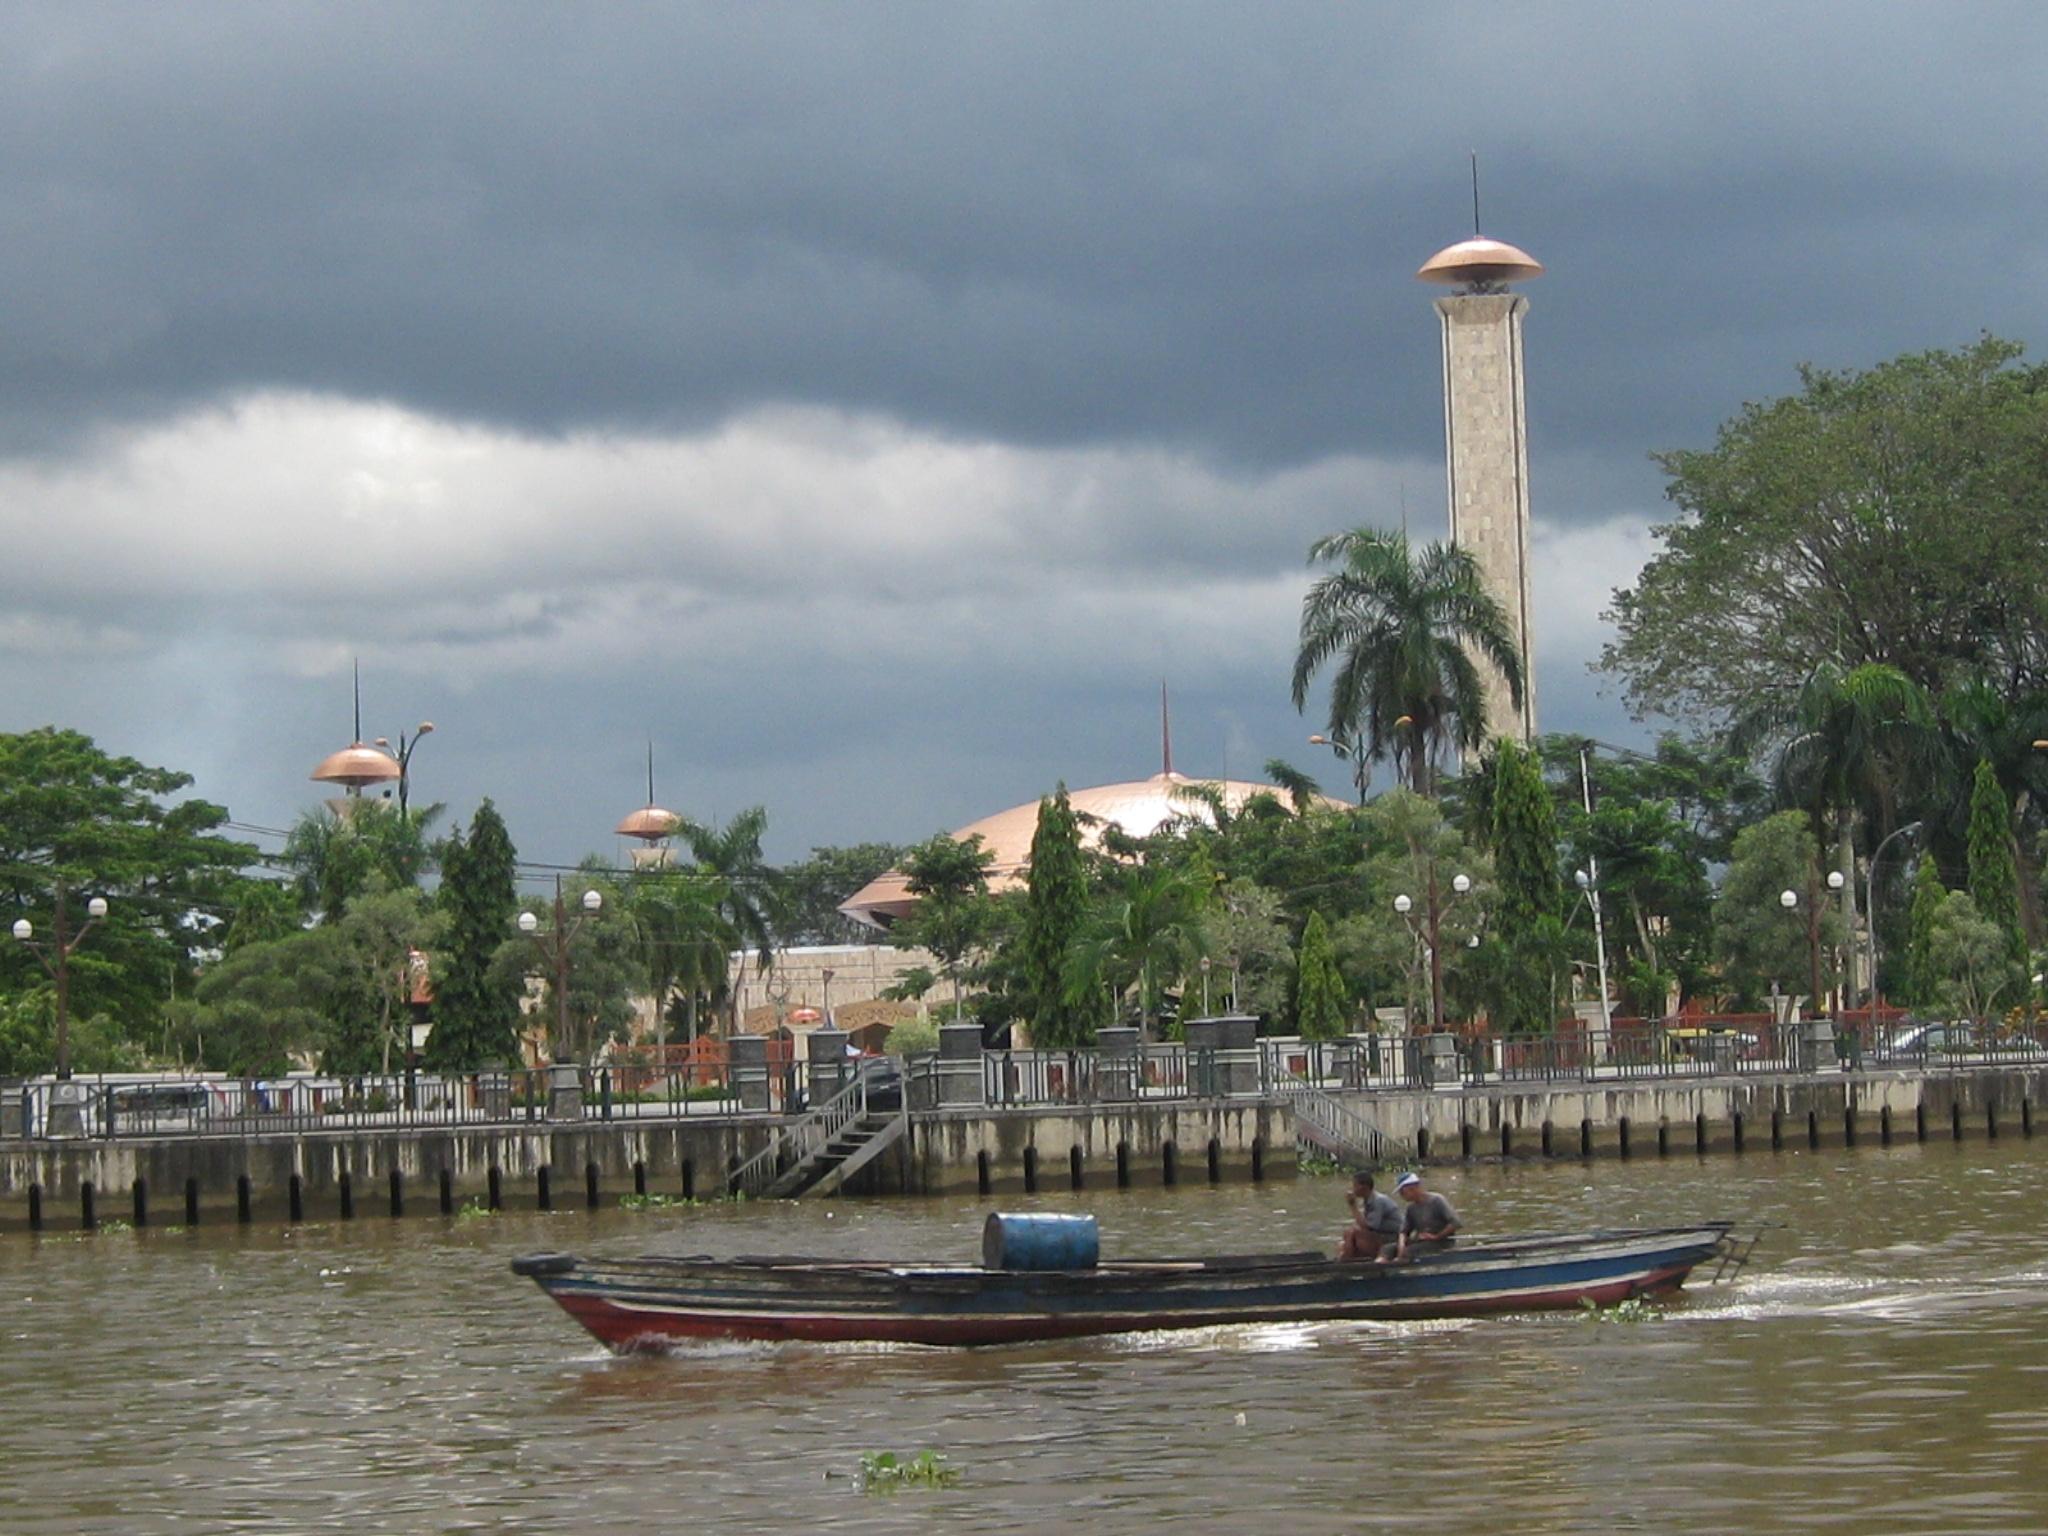 Kalimantan Purnamatravel Blog Masjid Raya Sabilal Muhtadin Kab Banjarmasin